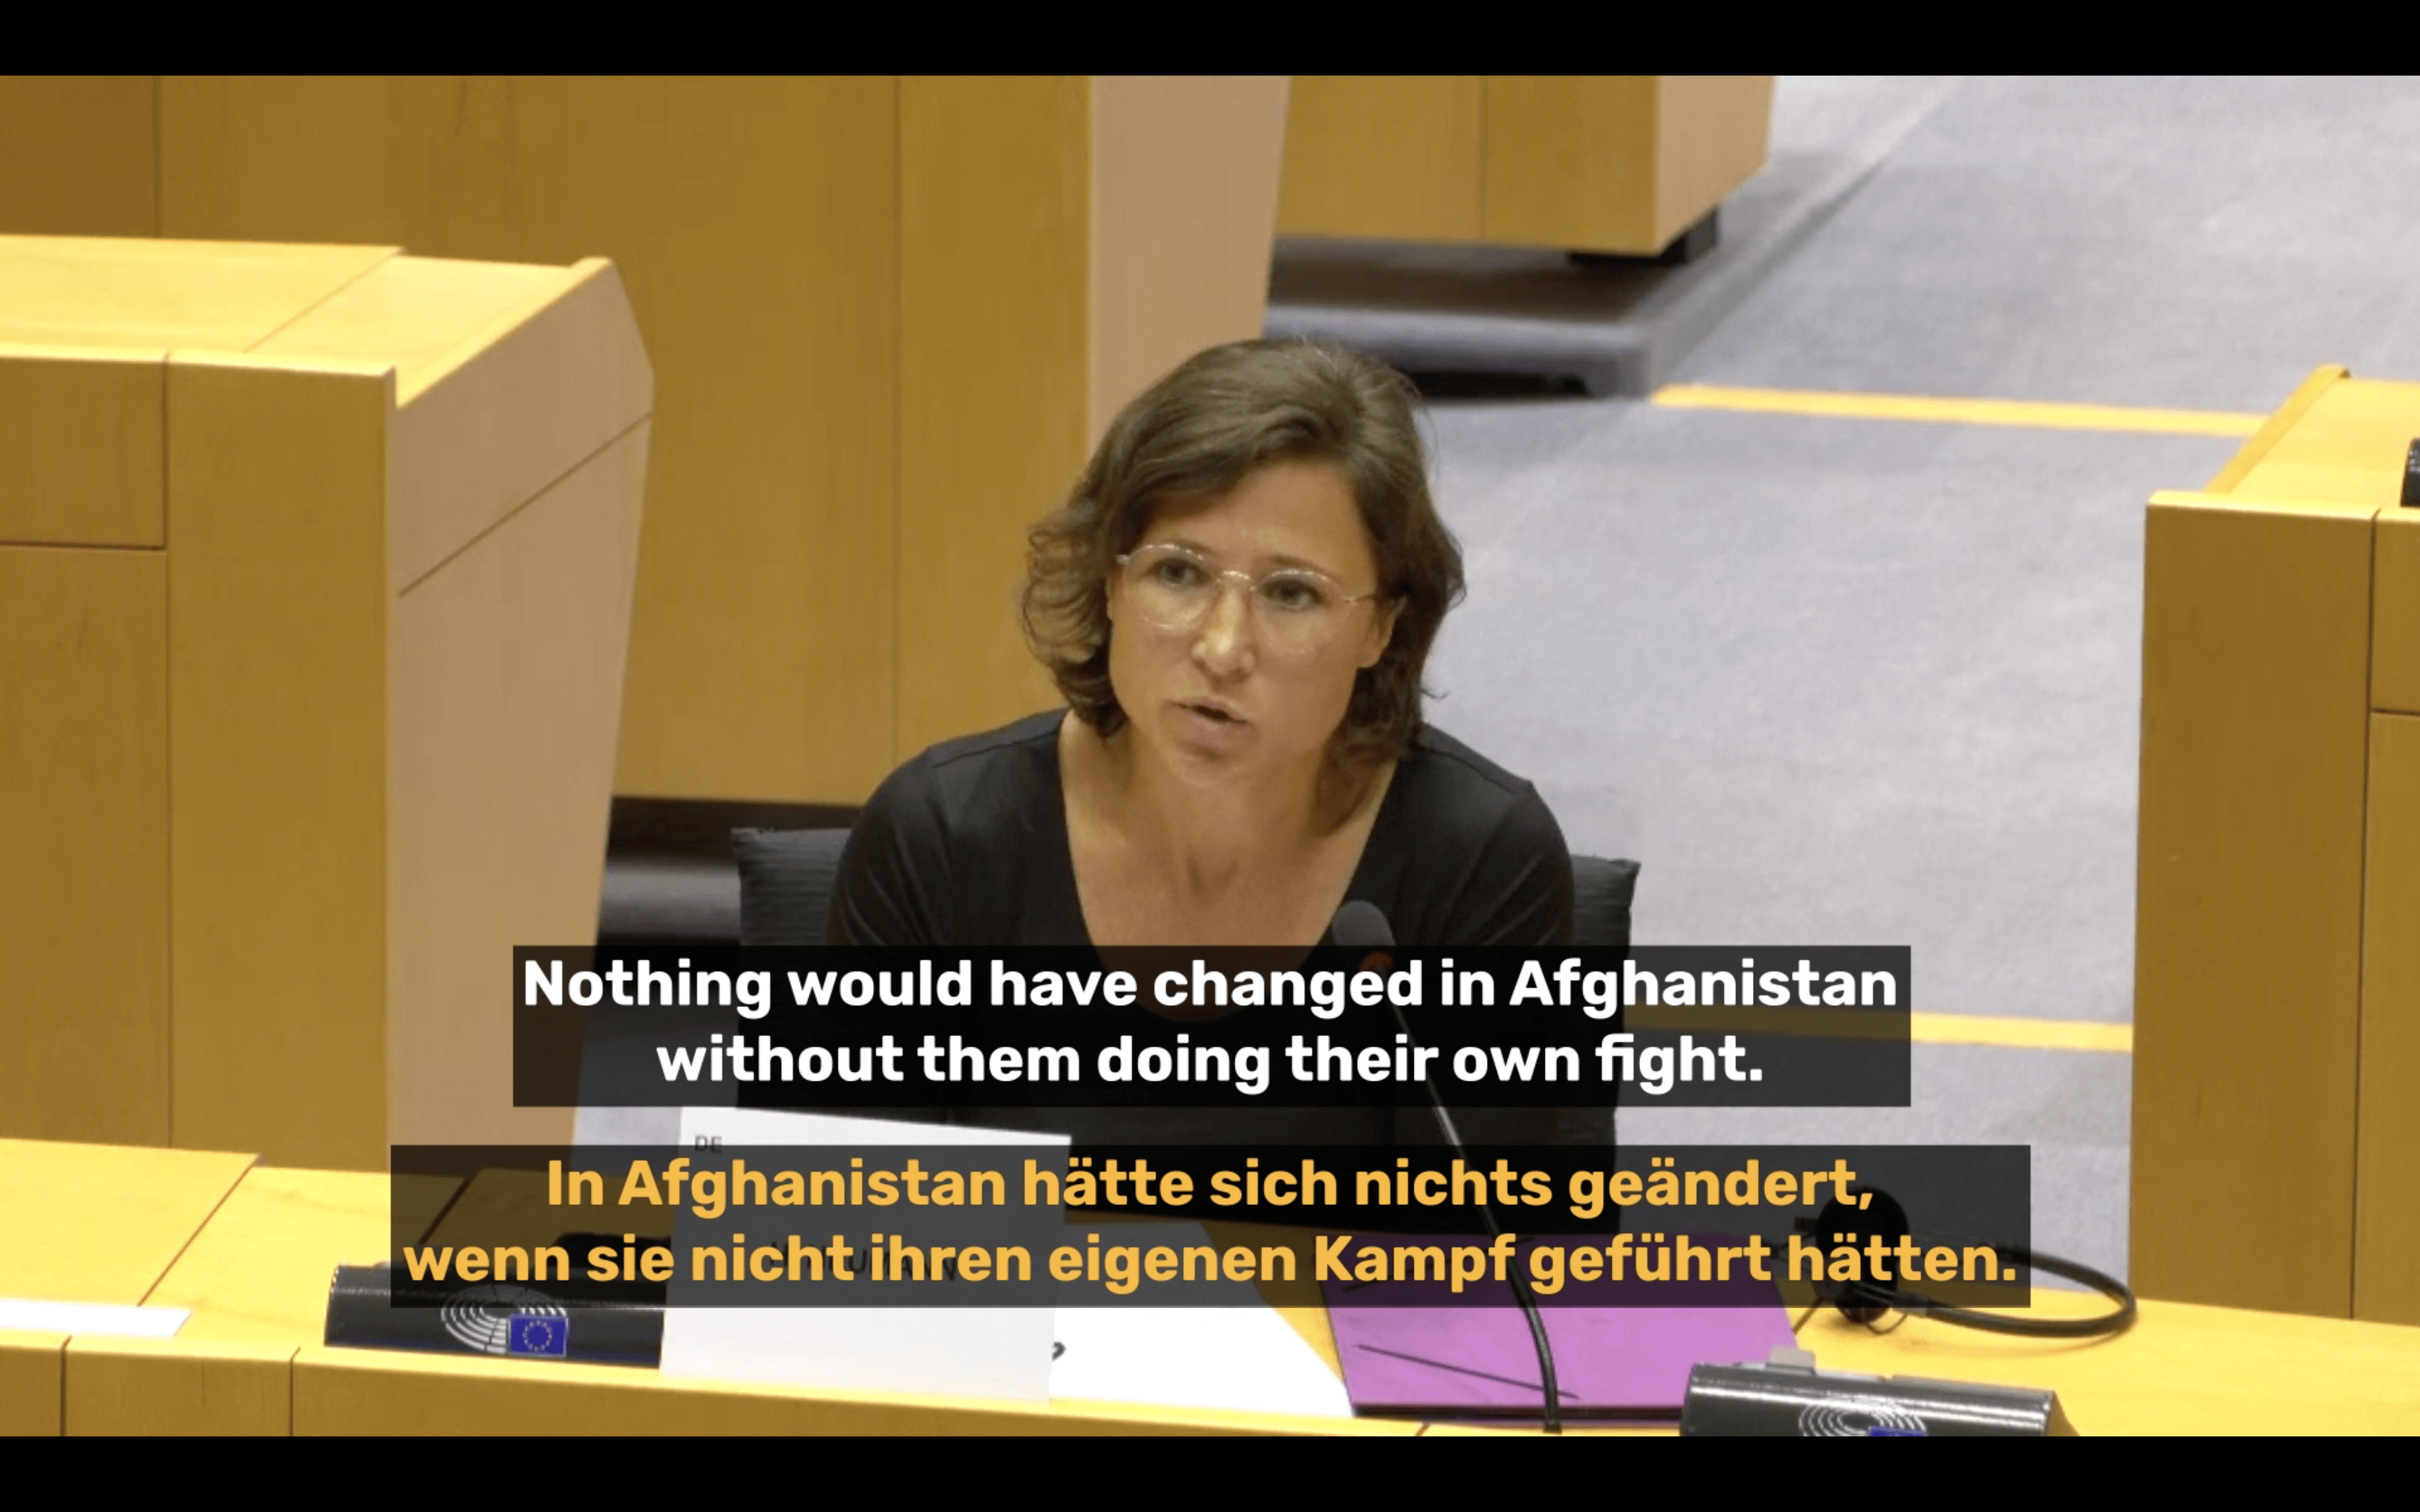 Abgeordnete diskutieren über Frauenrechte in Afghanistan